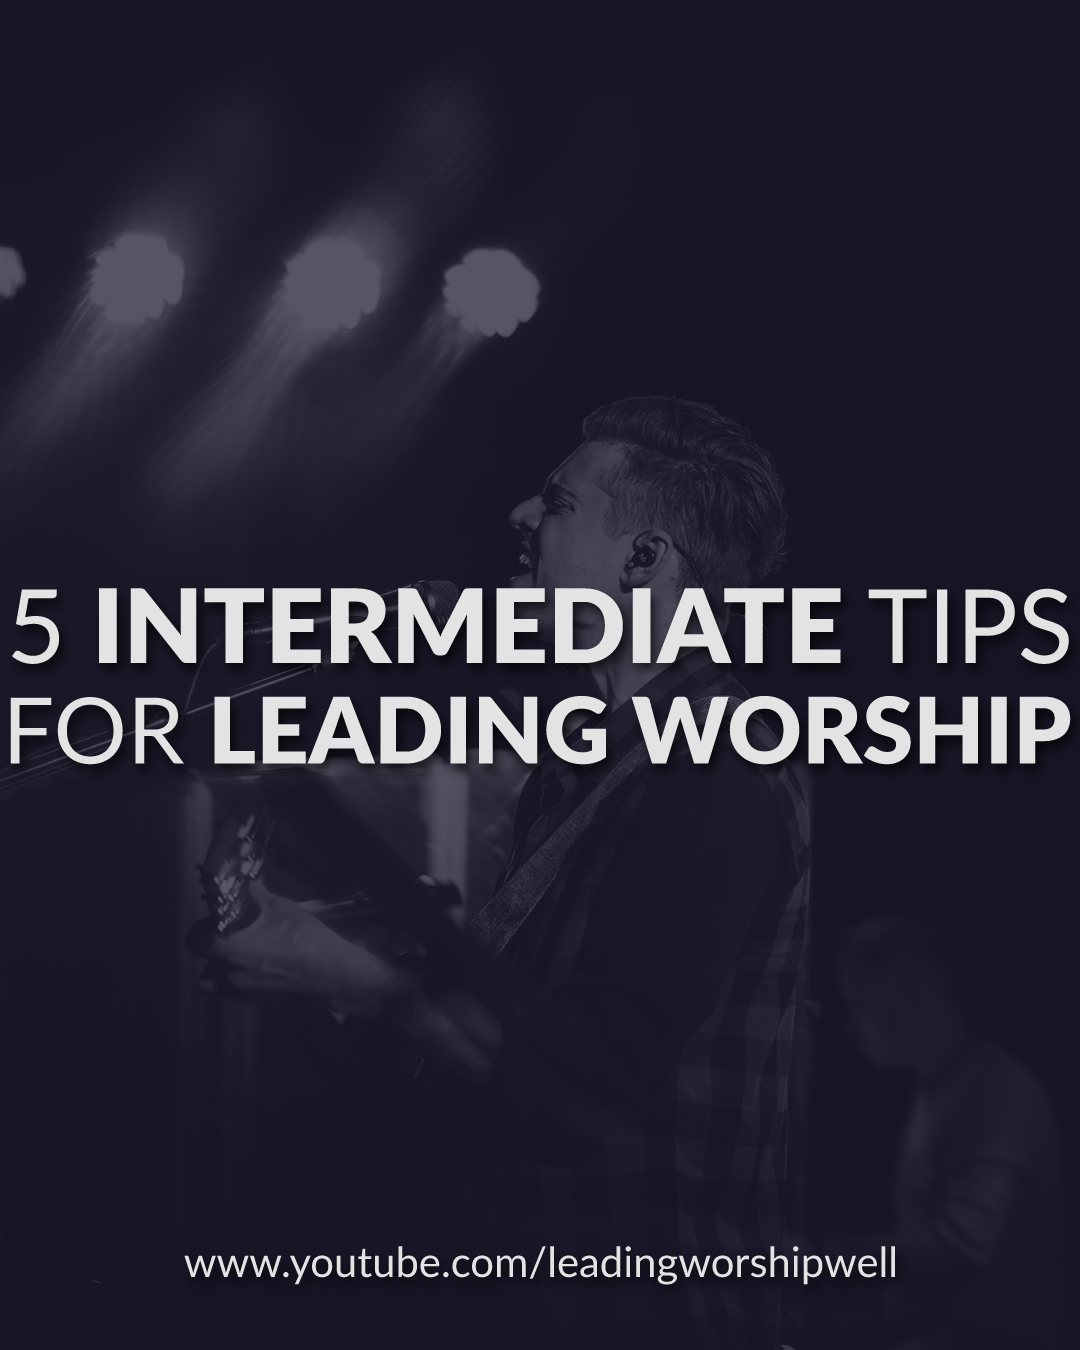 5 Intermediate Tips For Worship Leaders (Video)